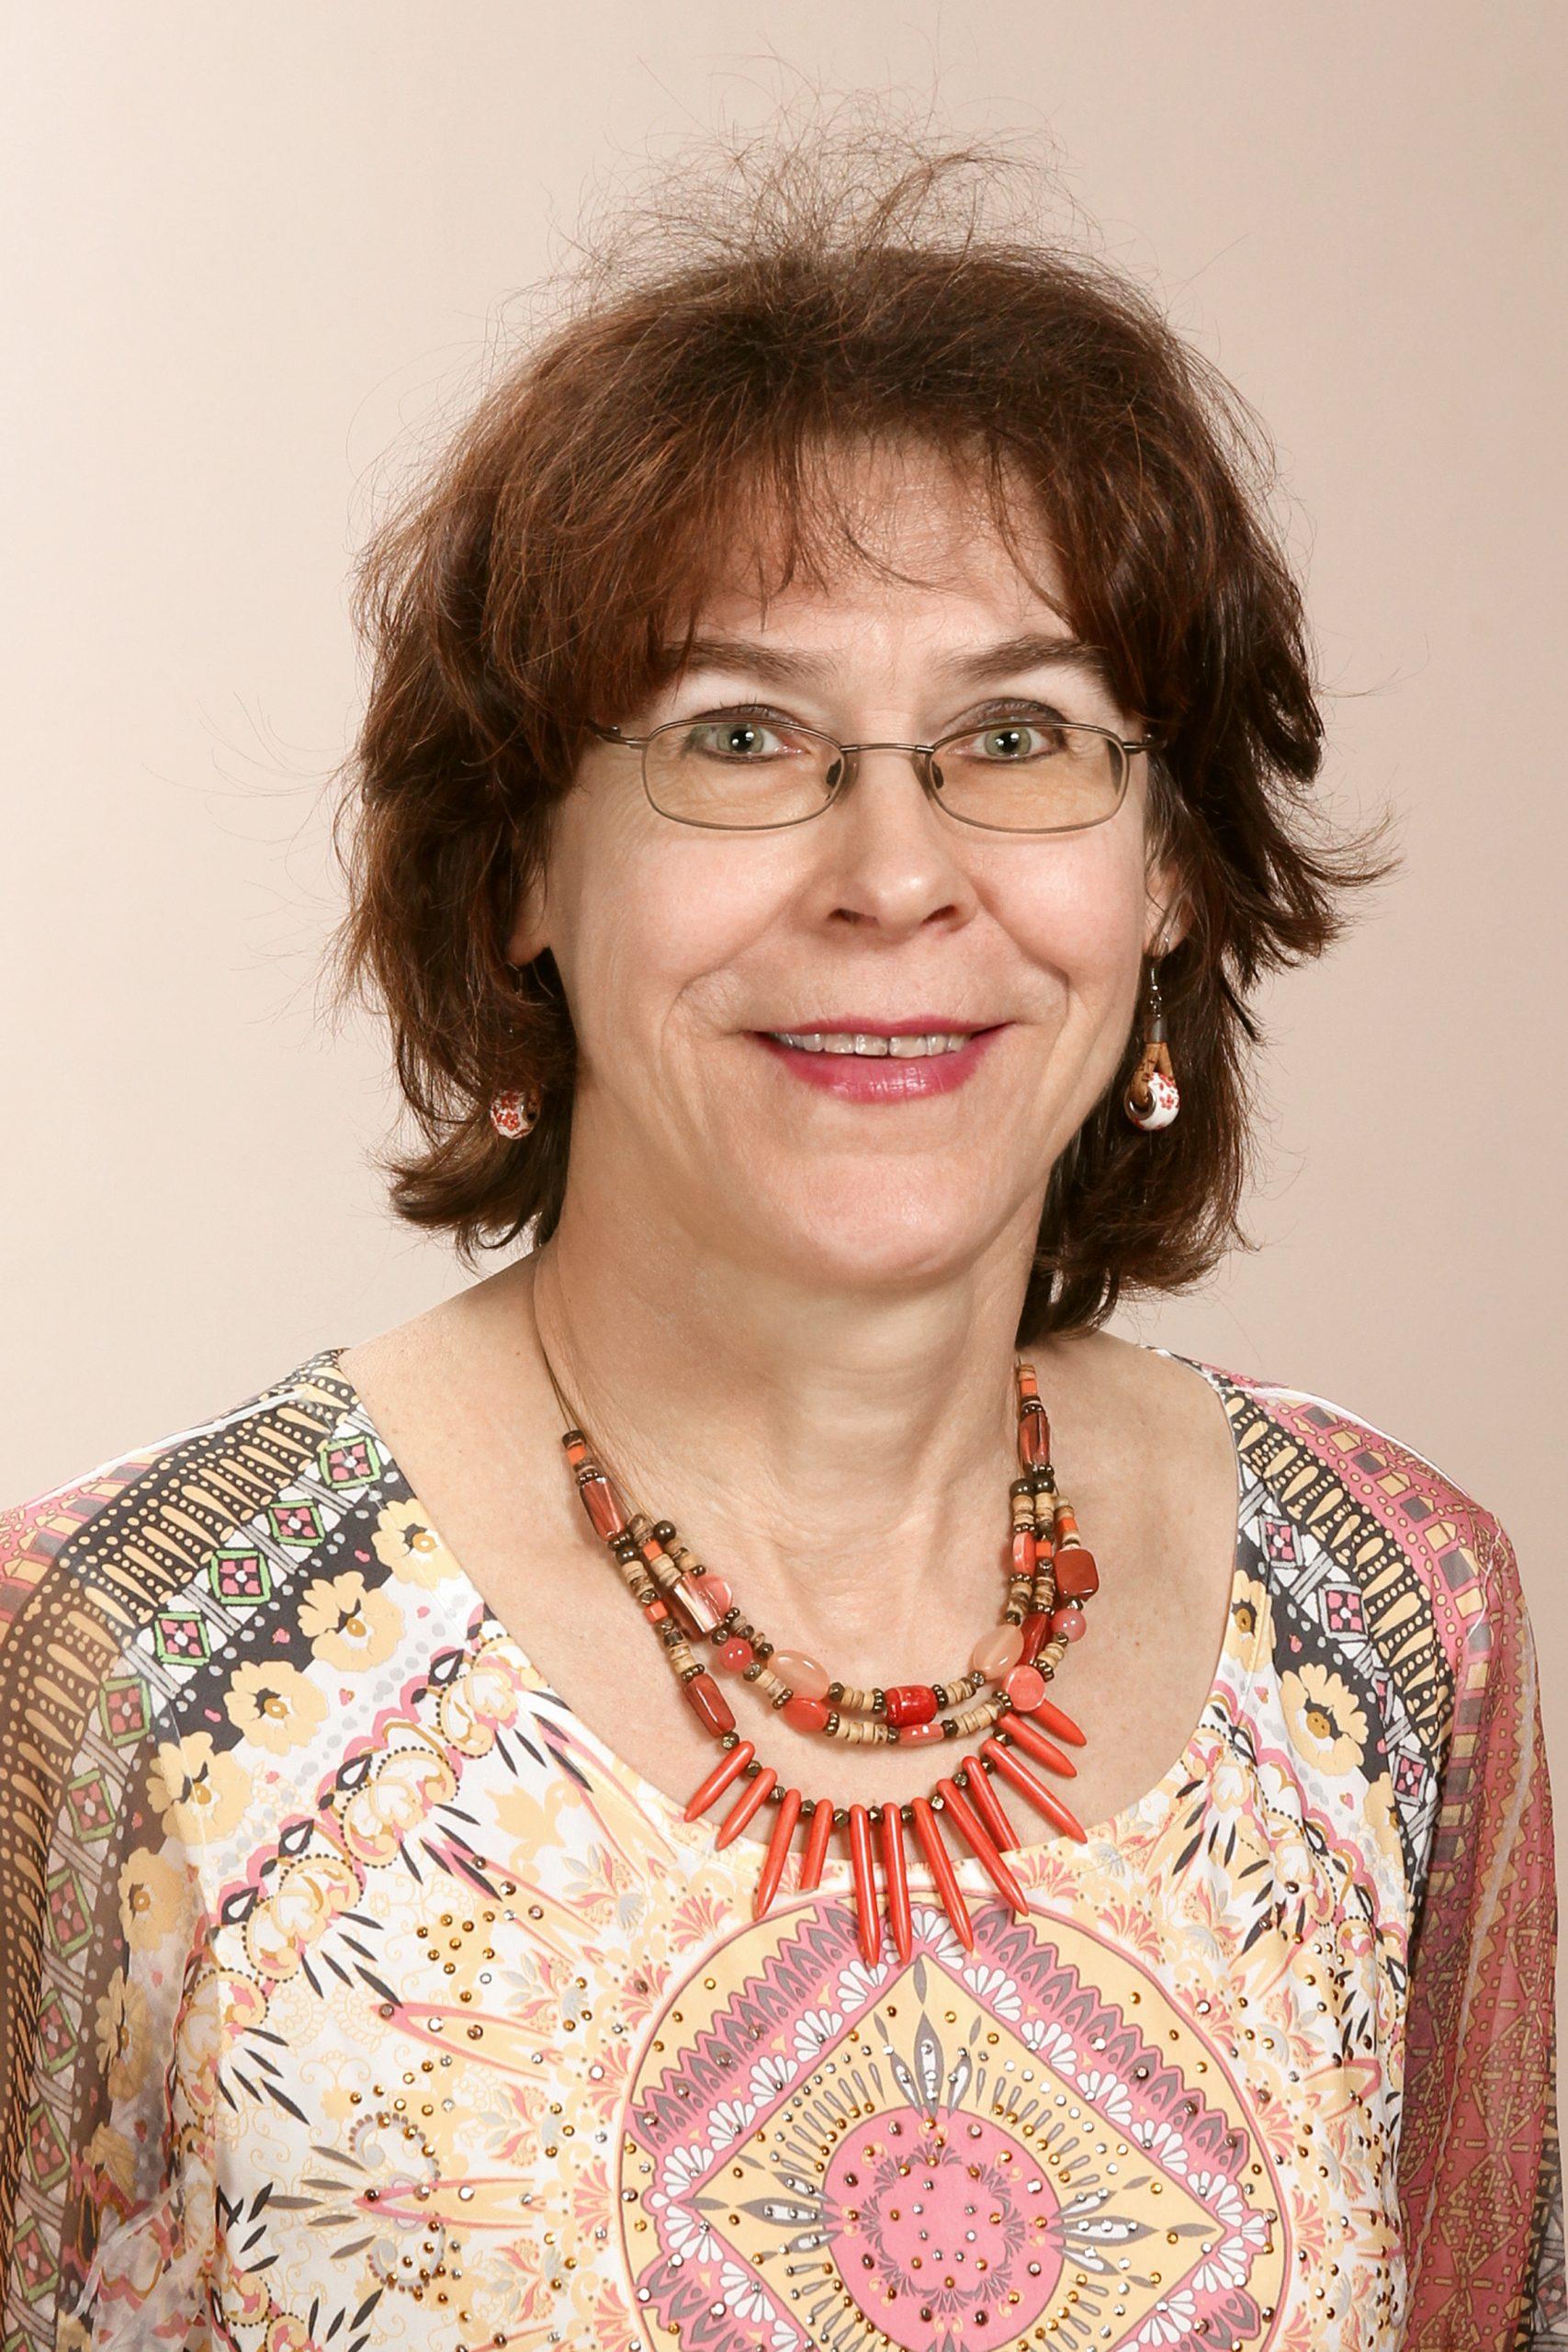 Sandra Briede